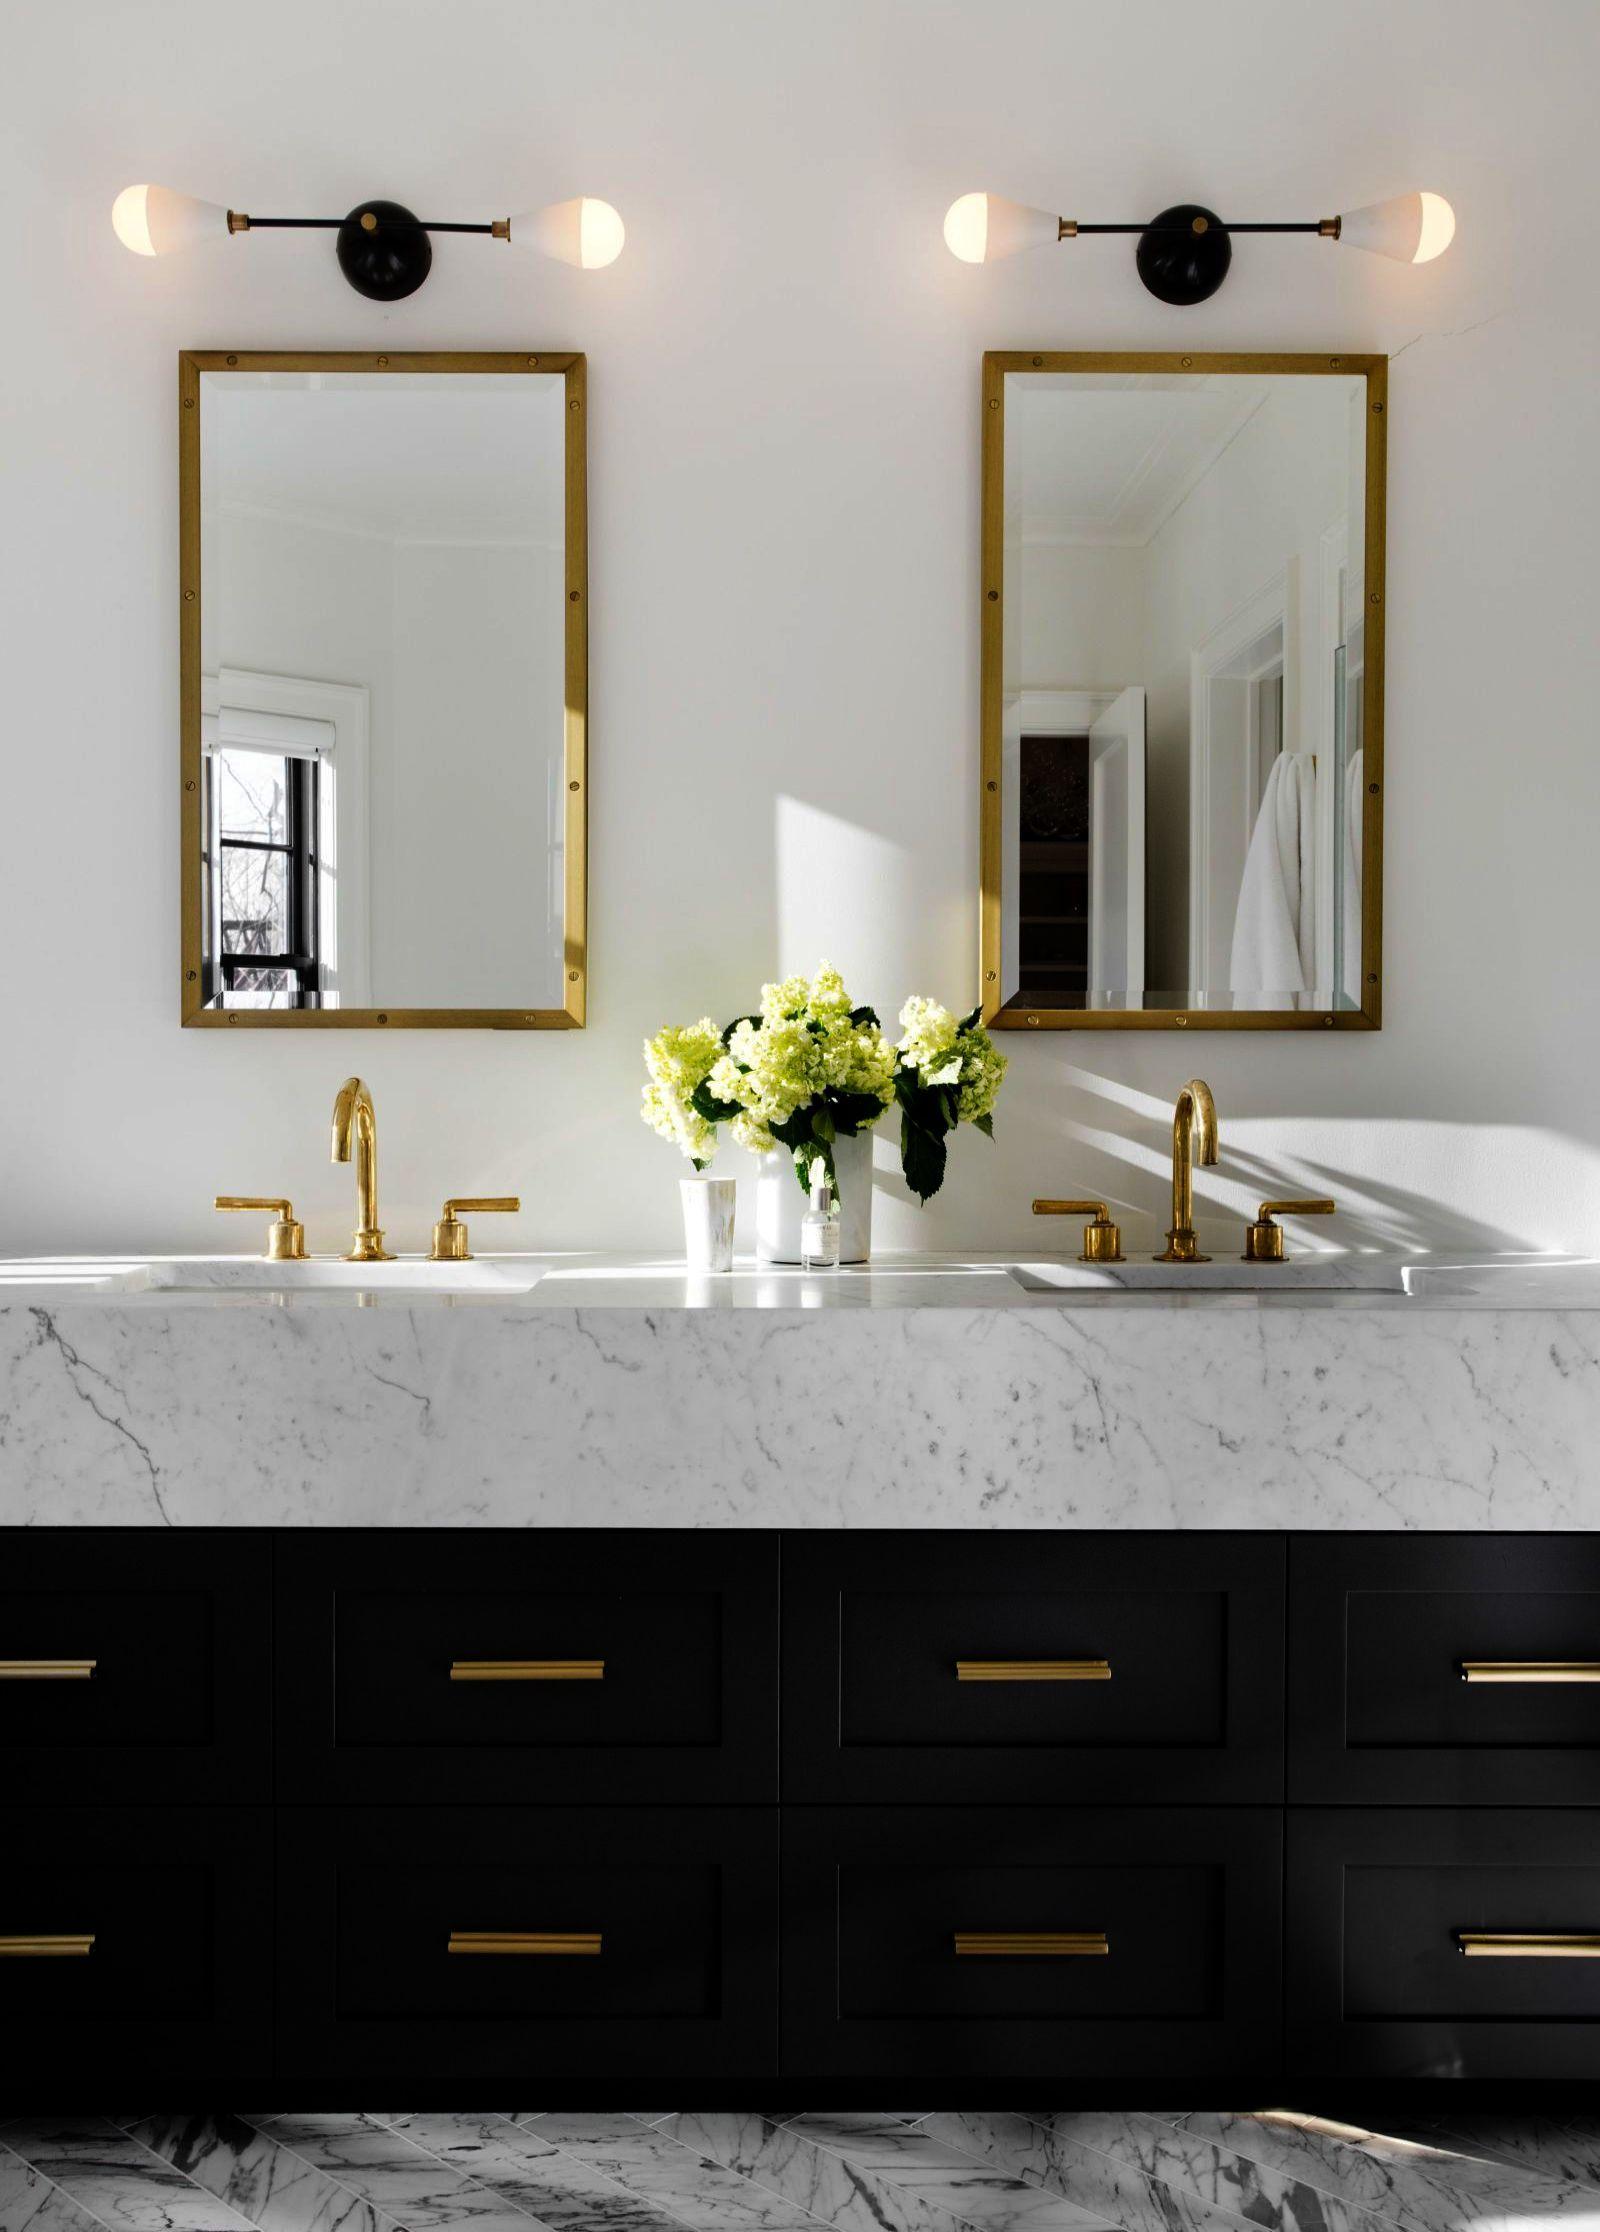 Luxury Bathrooms For Rent Elegant Bathroom Accessories Uk Luxury